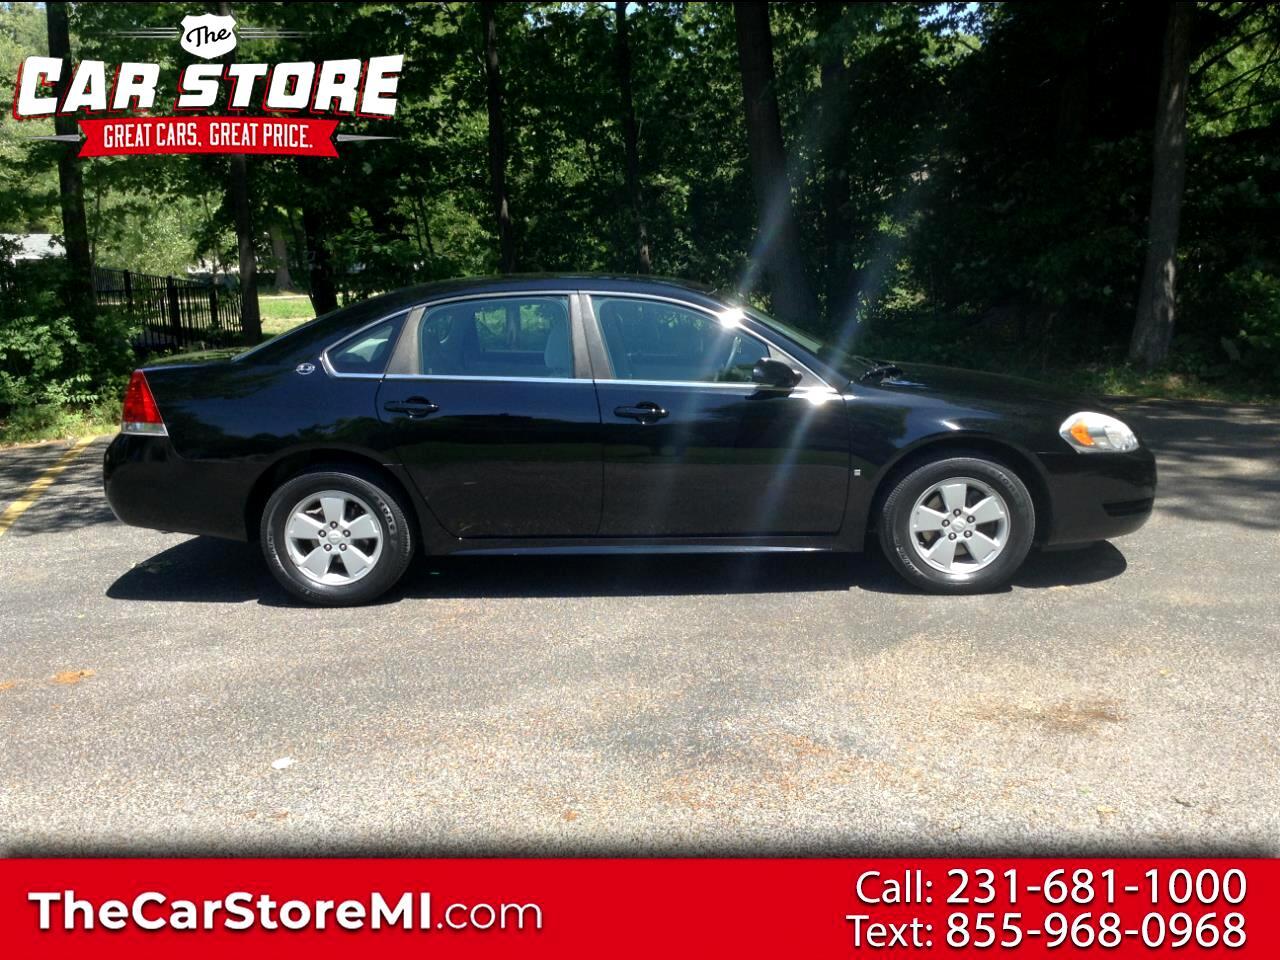 Chevrolet Impala 4dr Sdn 3.5L LT 2009